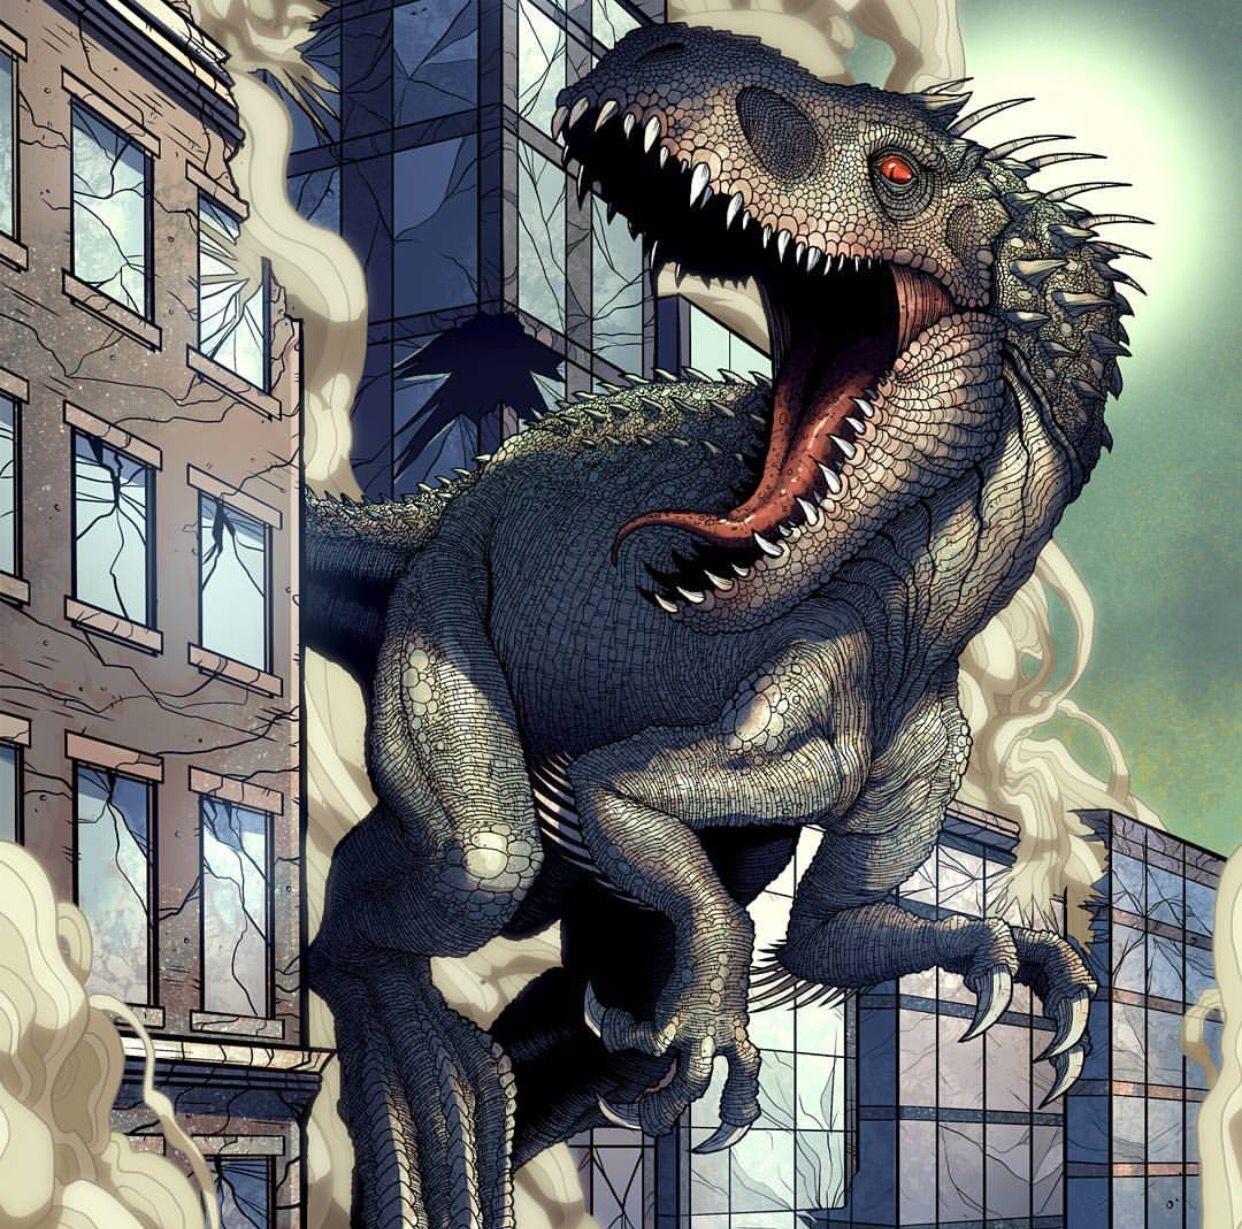 Indominusrex Jurassic world dinosaurs, Jurassic world